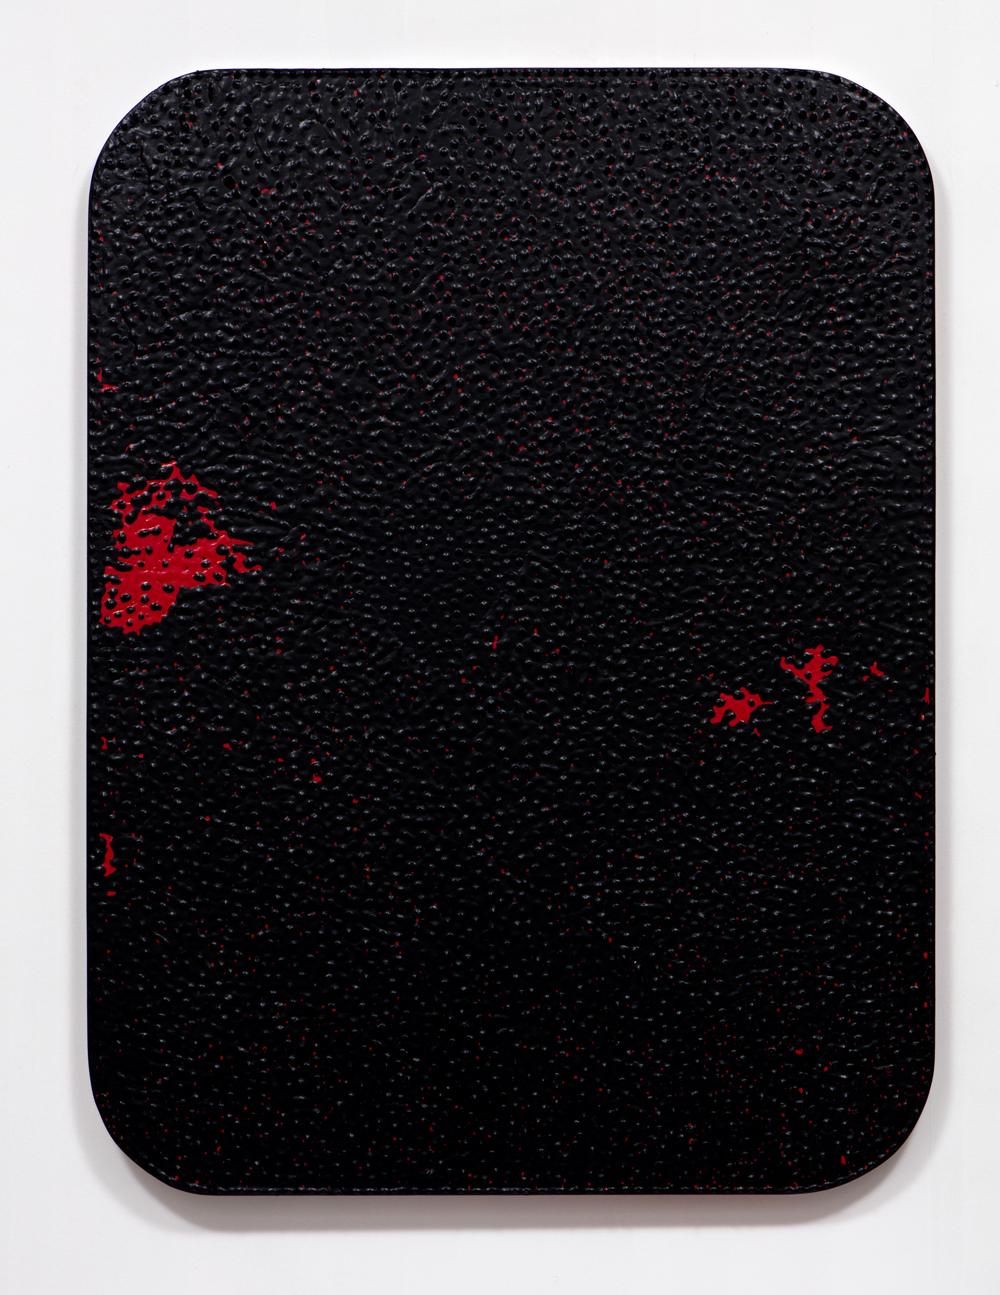 SLATE: Dip Painting No. 3 (1b, 1r, 1b)  , 2015 Valspar Reserve Semi-Gloss Interior Paint, Valspar Signature Satin Interior Painting and Dipping on custom panel 48 x 36 inches